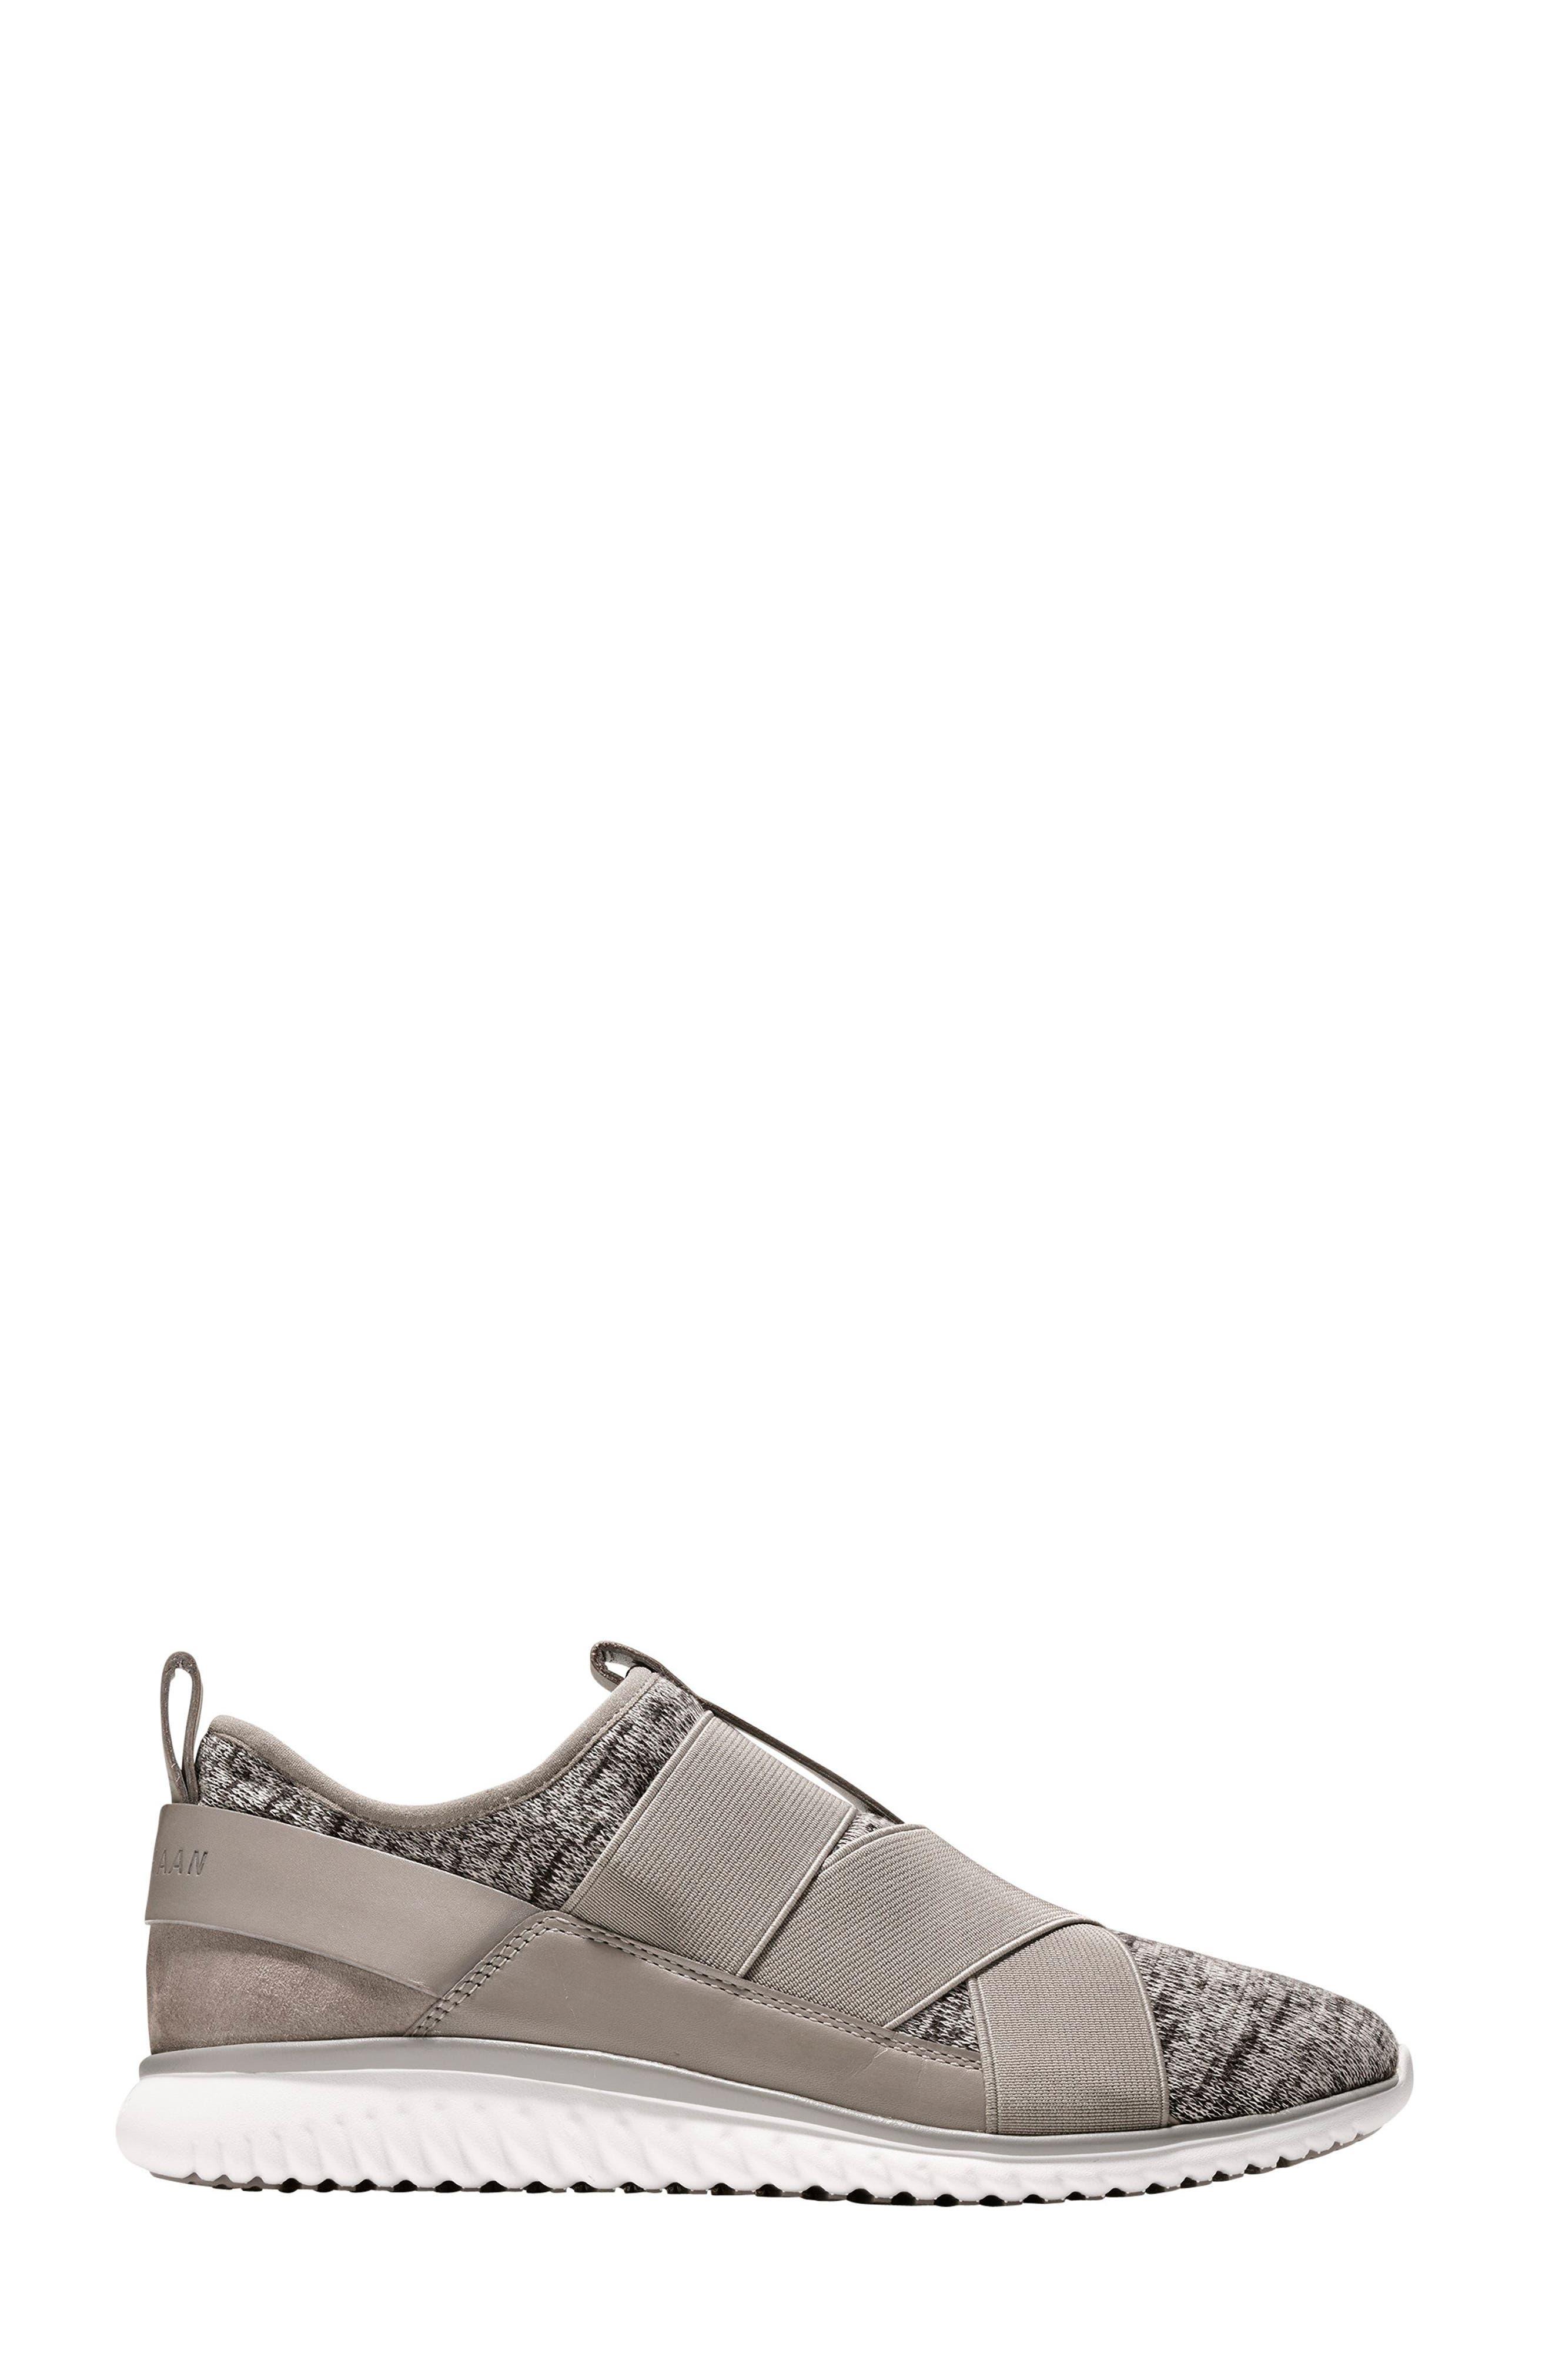 'StudioGrand' Sneaker,                             Alternate thumbnail 18, color,